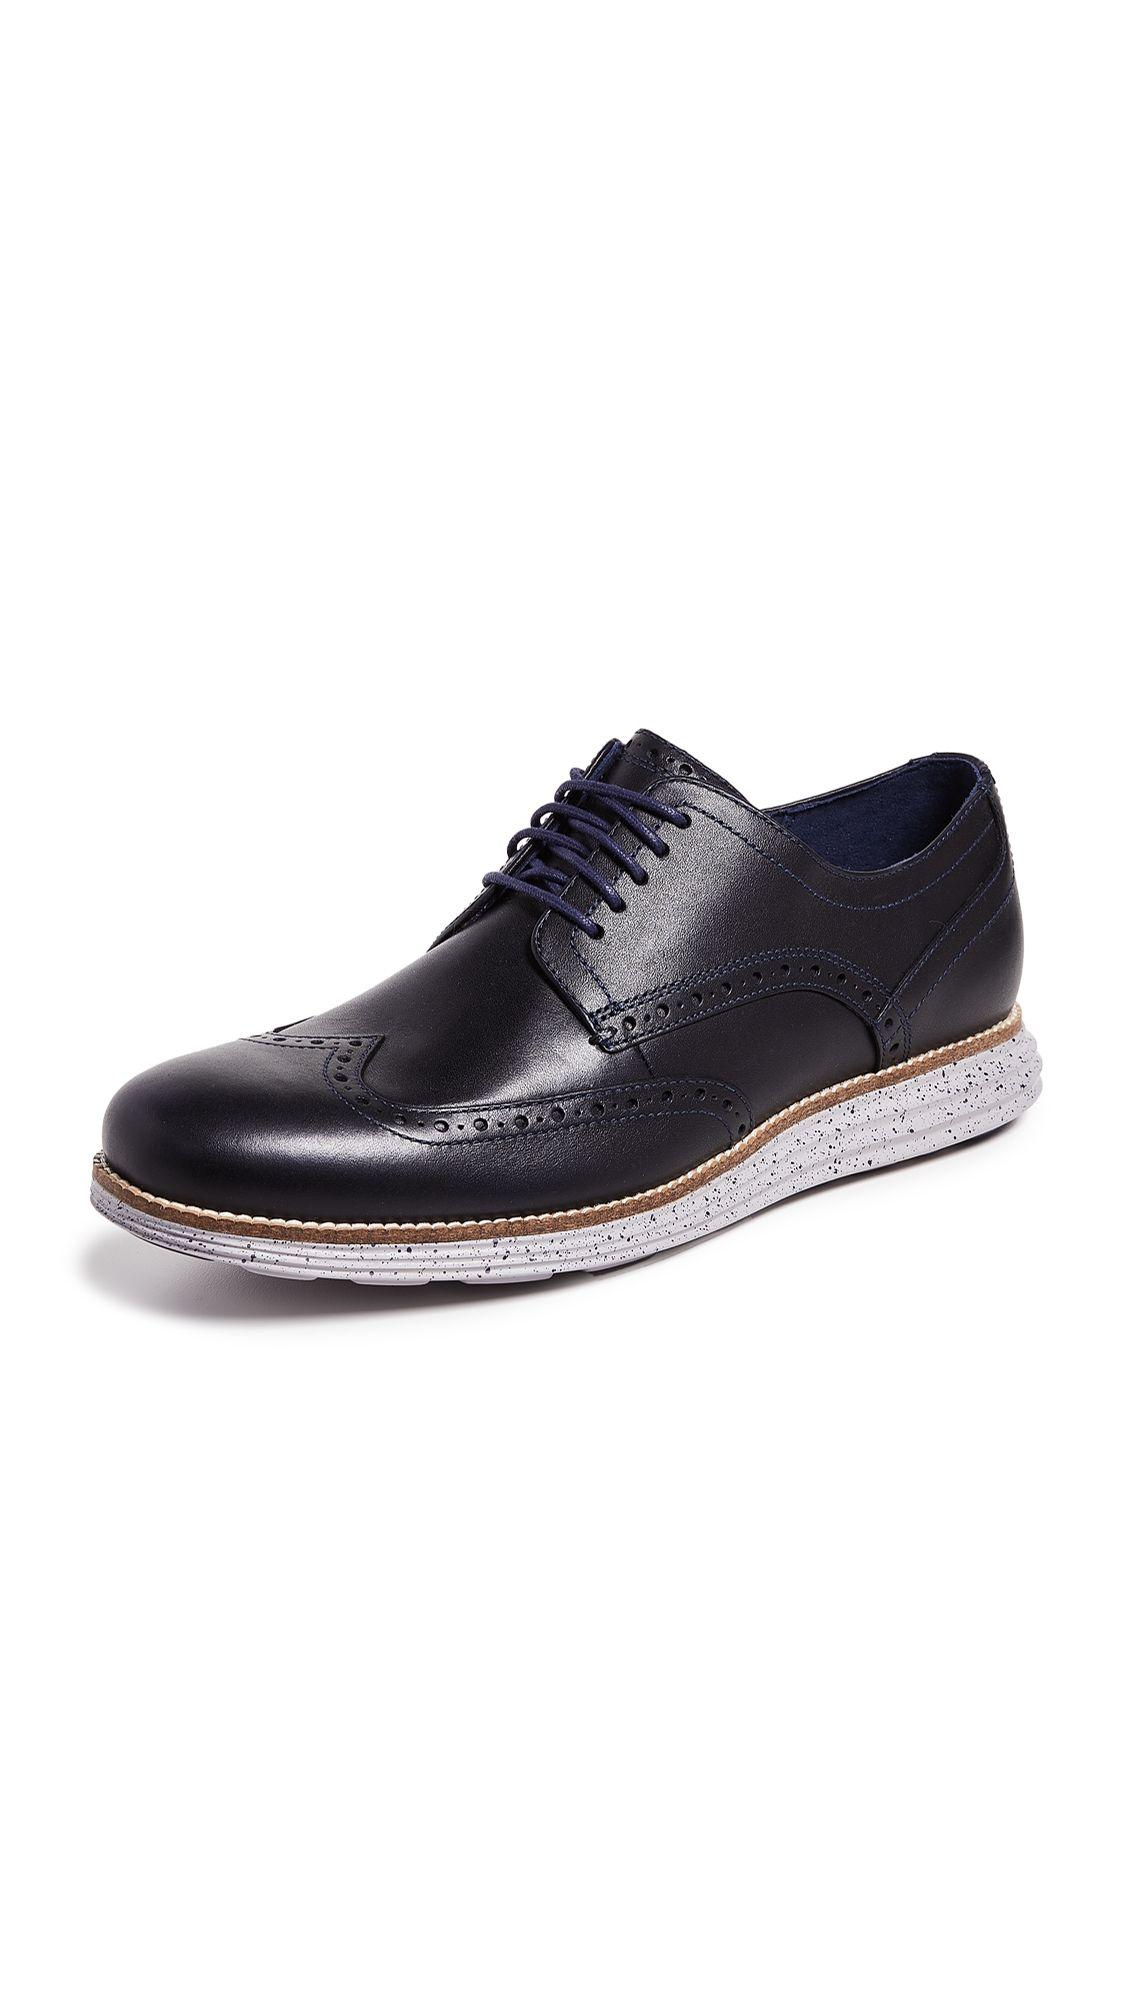 f423e6cdfd8 COLE HAAN ORIGINAL GRAND WINGTIP OXFORD SHOES.  colehaan  shoes ...